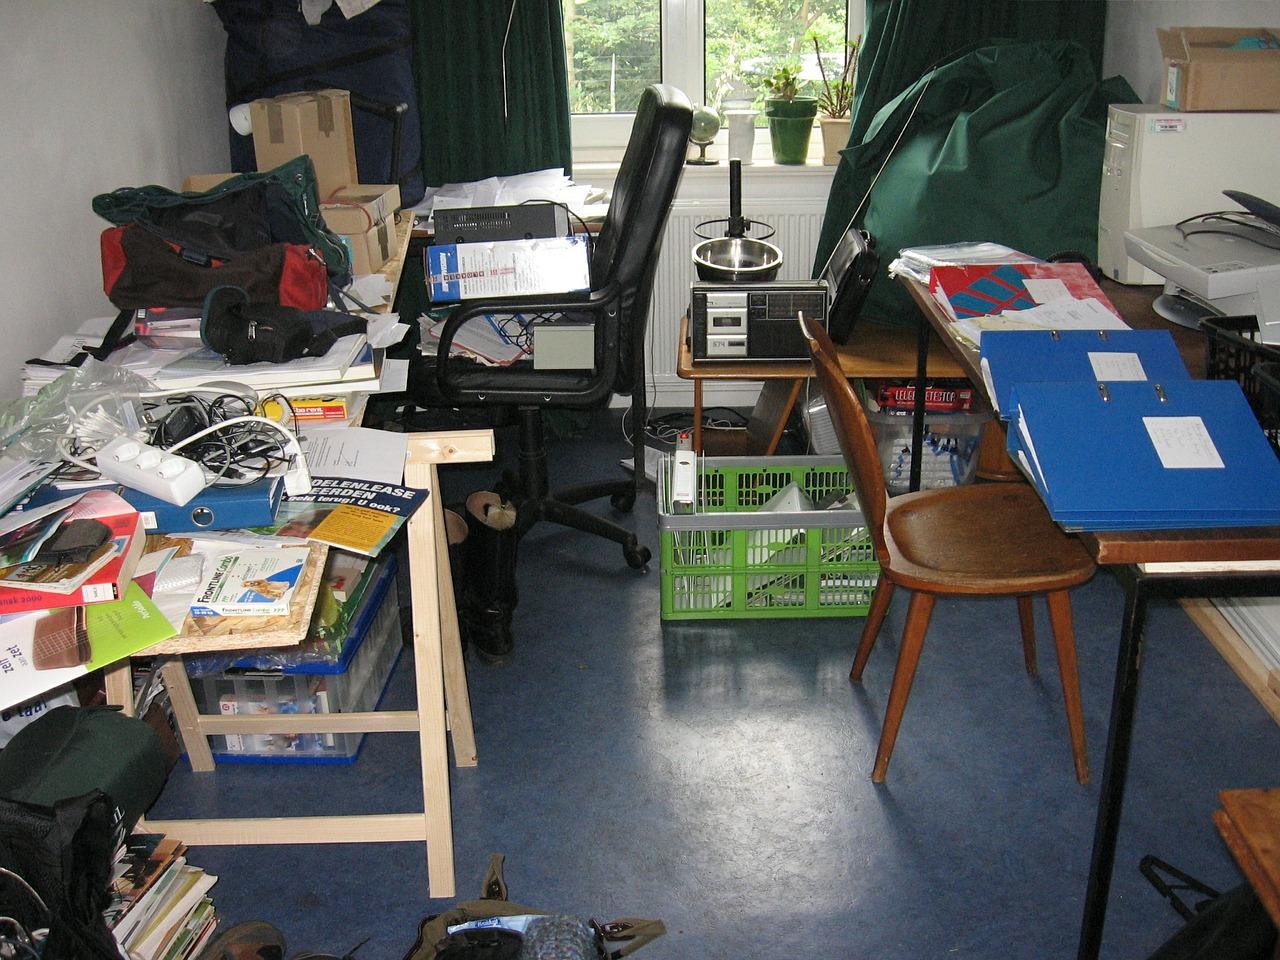 Metzler Blog - Clutter